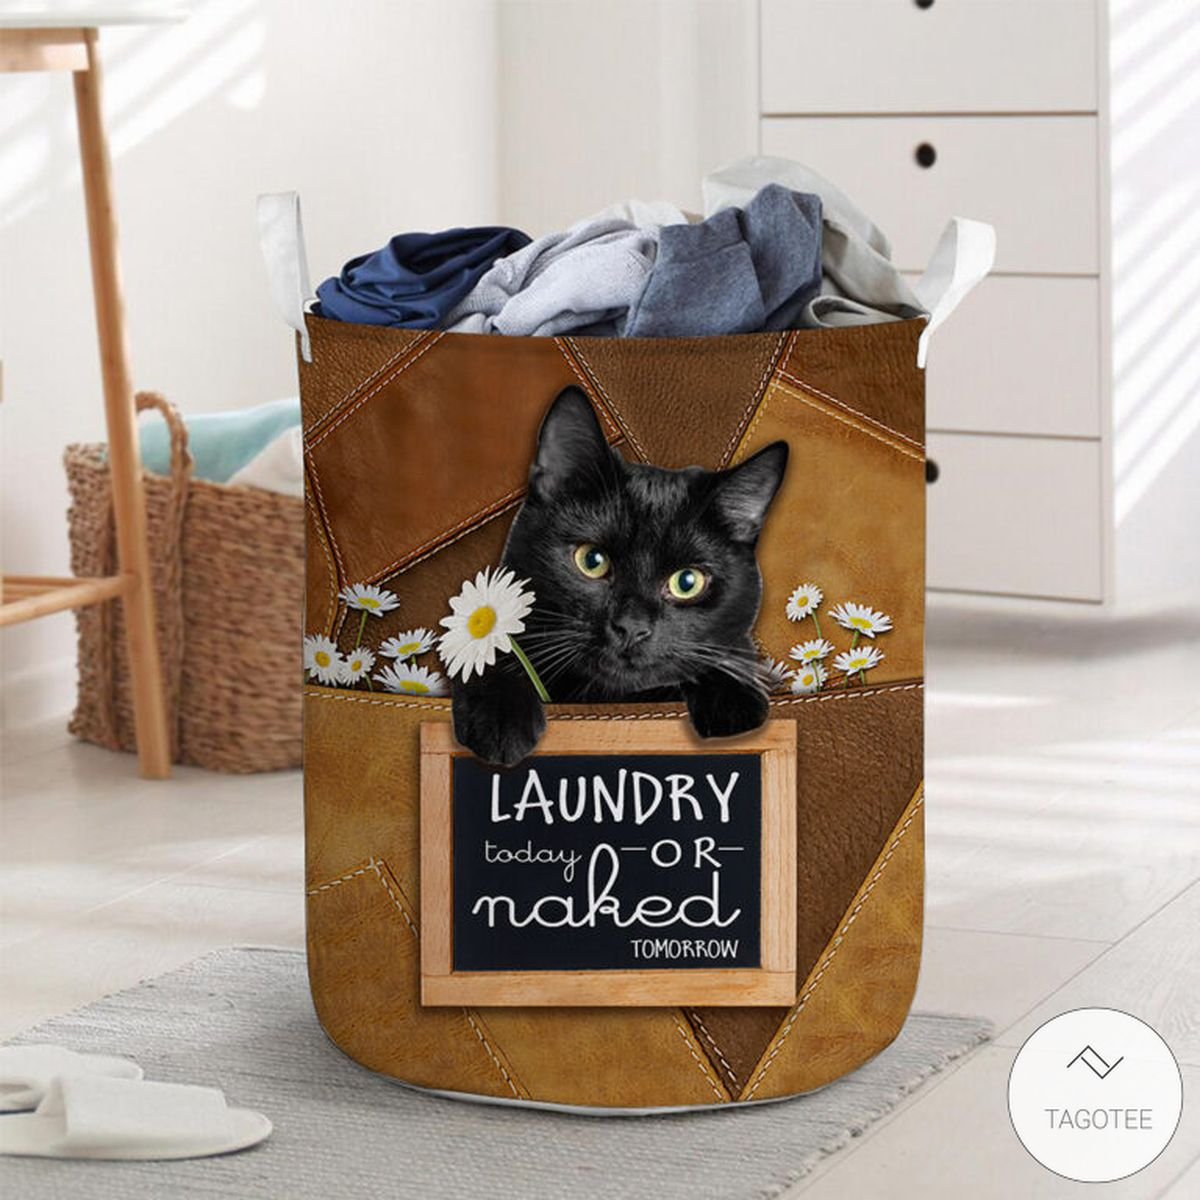 Black Cat Laundry Today Or Naked Tomorrow Laundry Basket